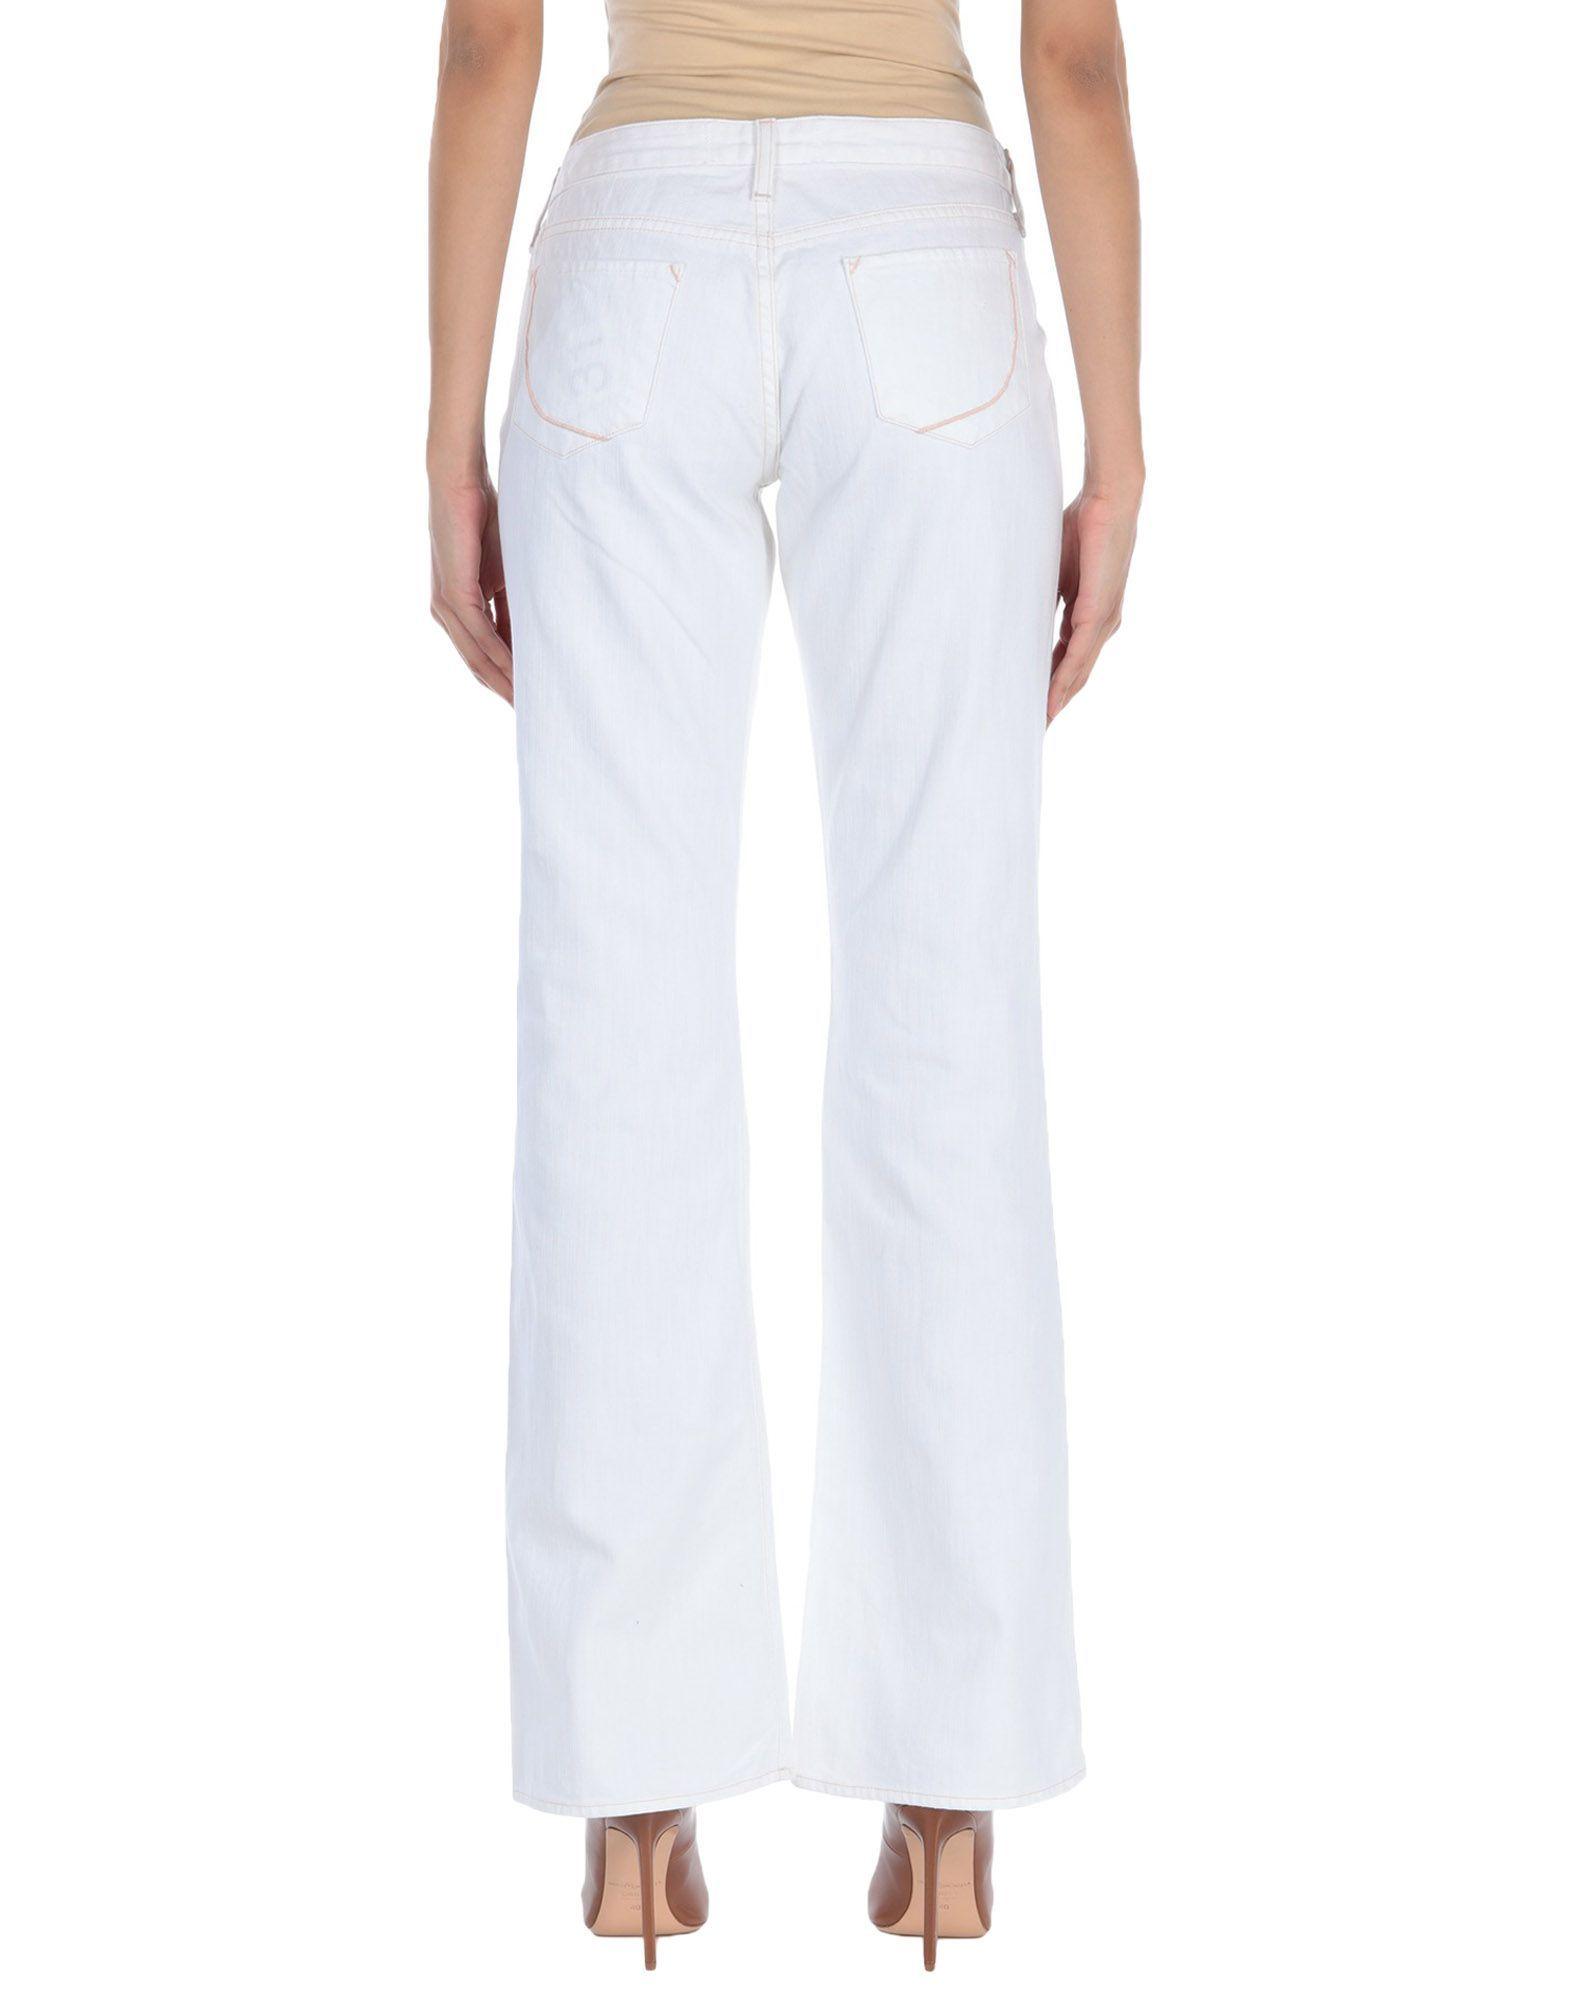 Paperdenim&Cloth White Cotton Wide Leg Jeans